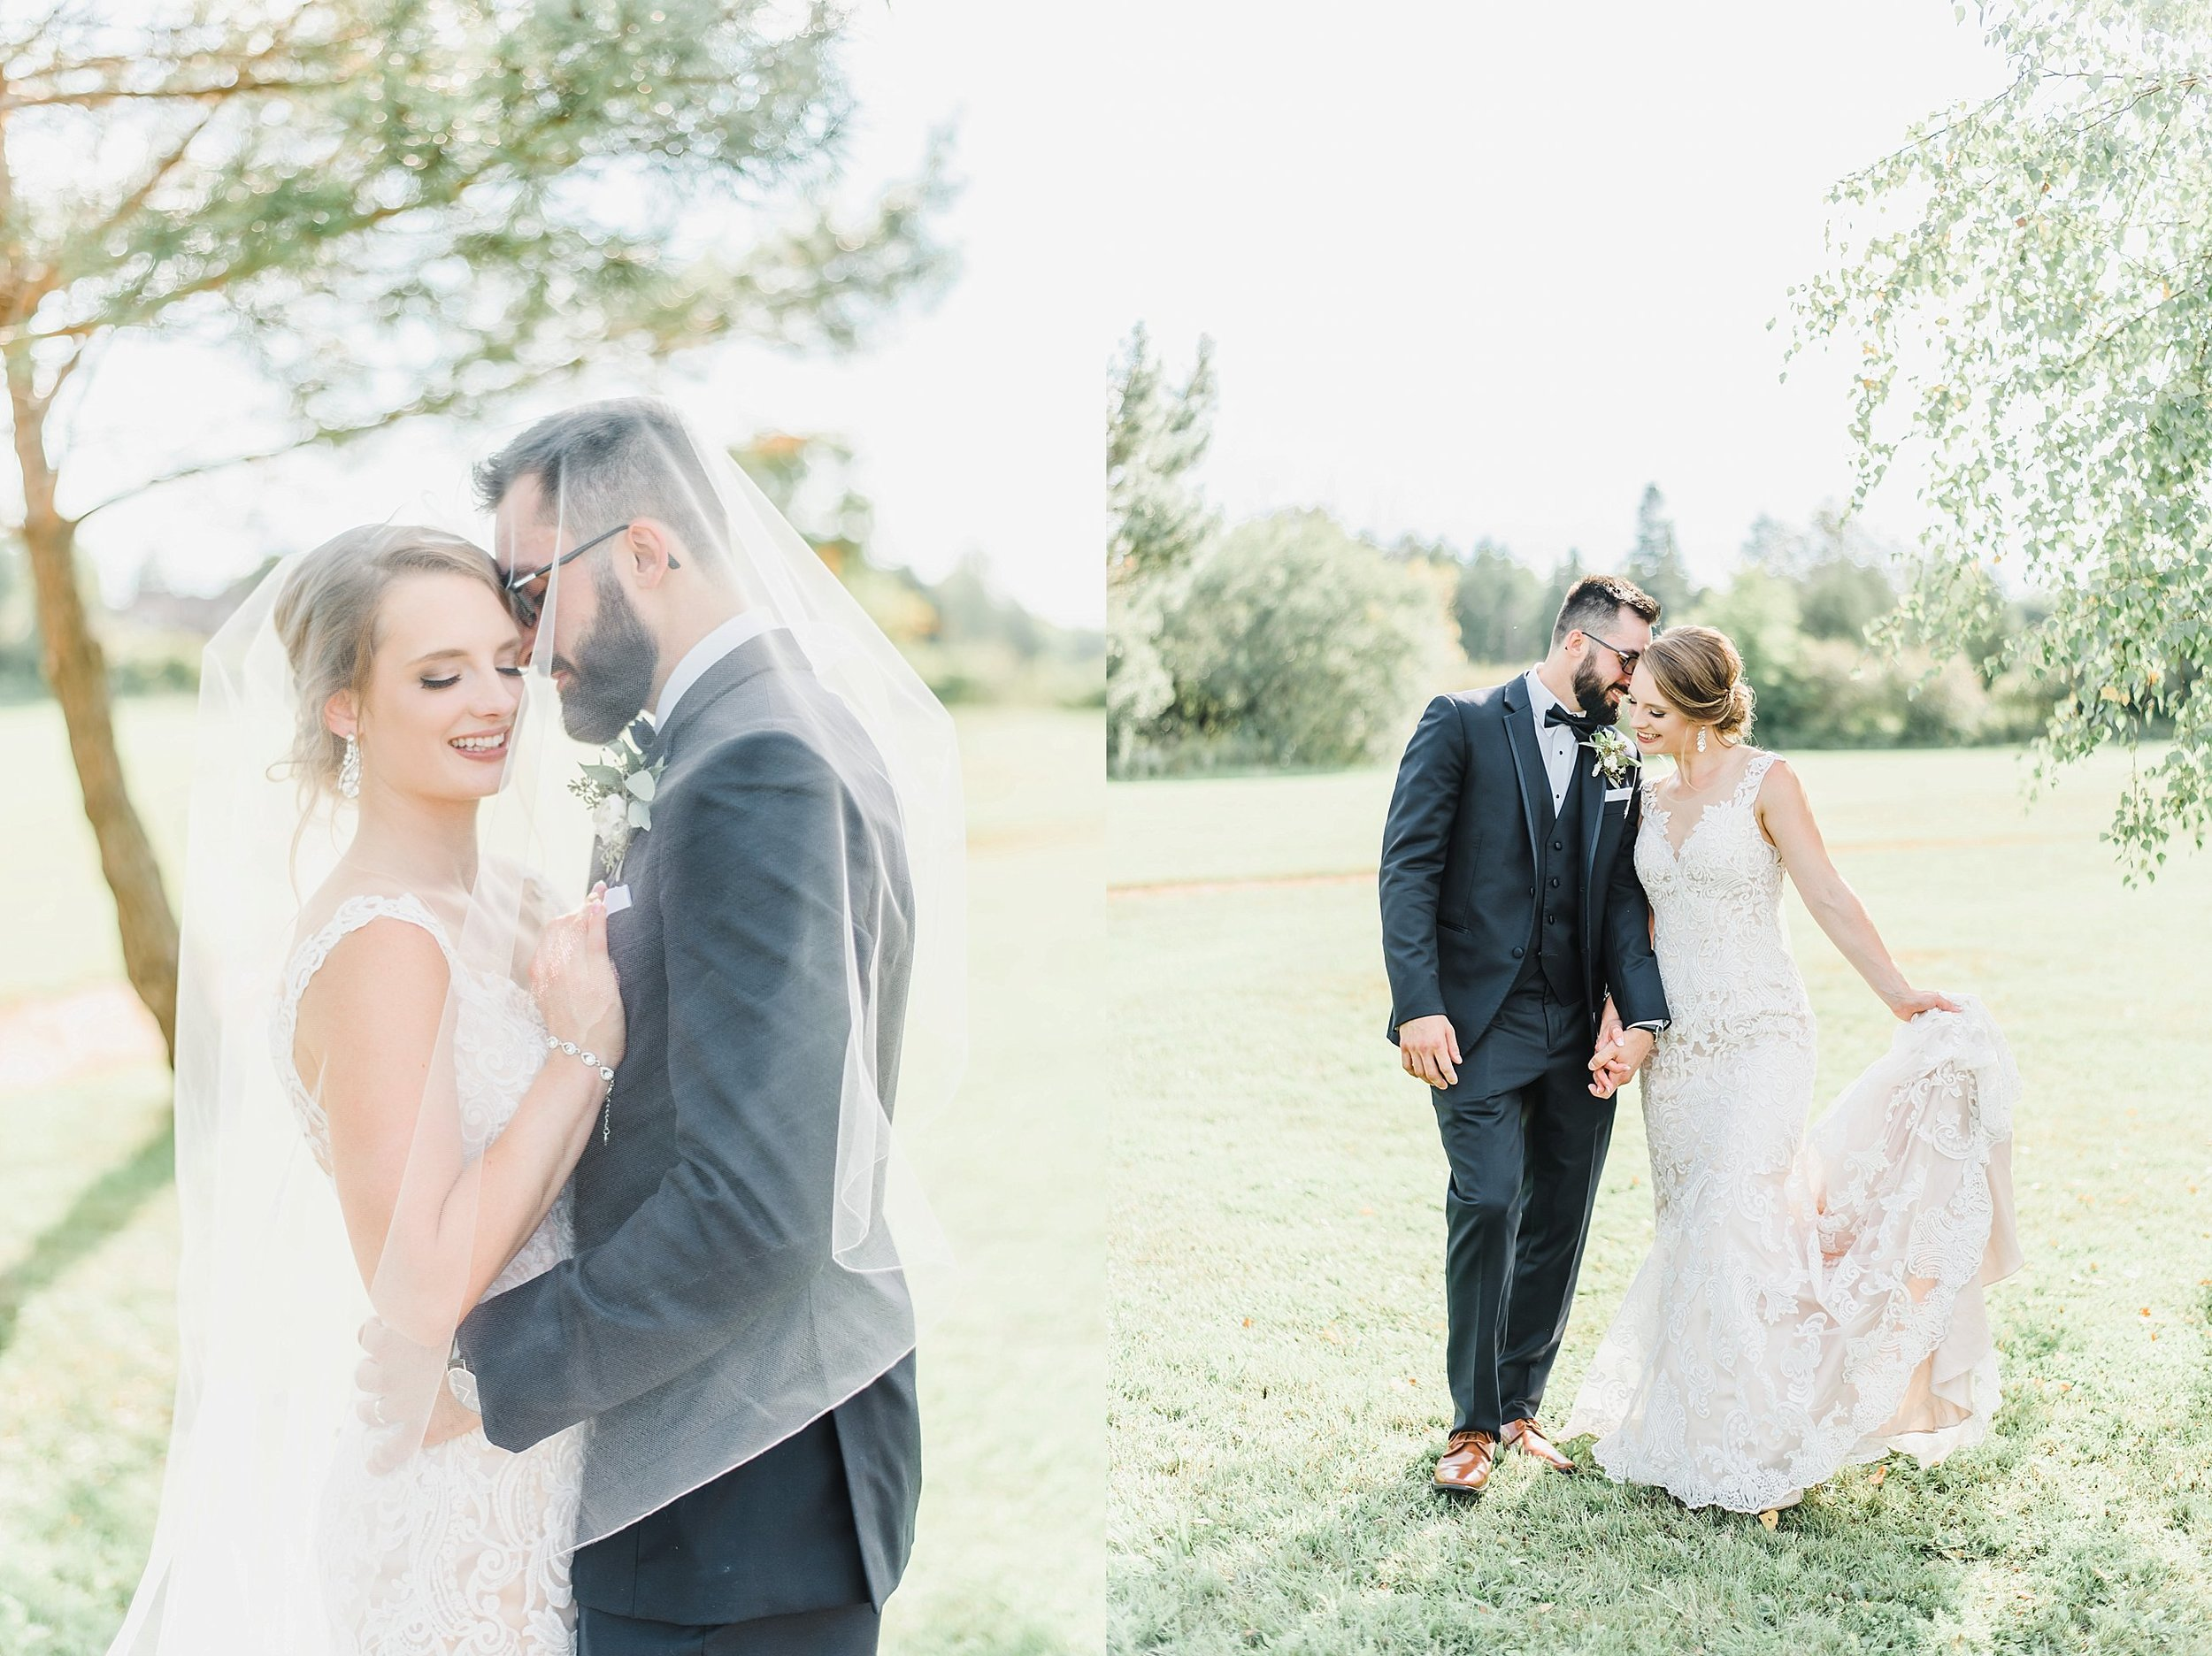 light airy indie fine art ottawa wedding photographer | Ali and Batoul Photography_1307.jpg